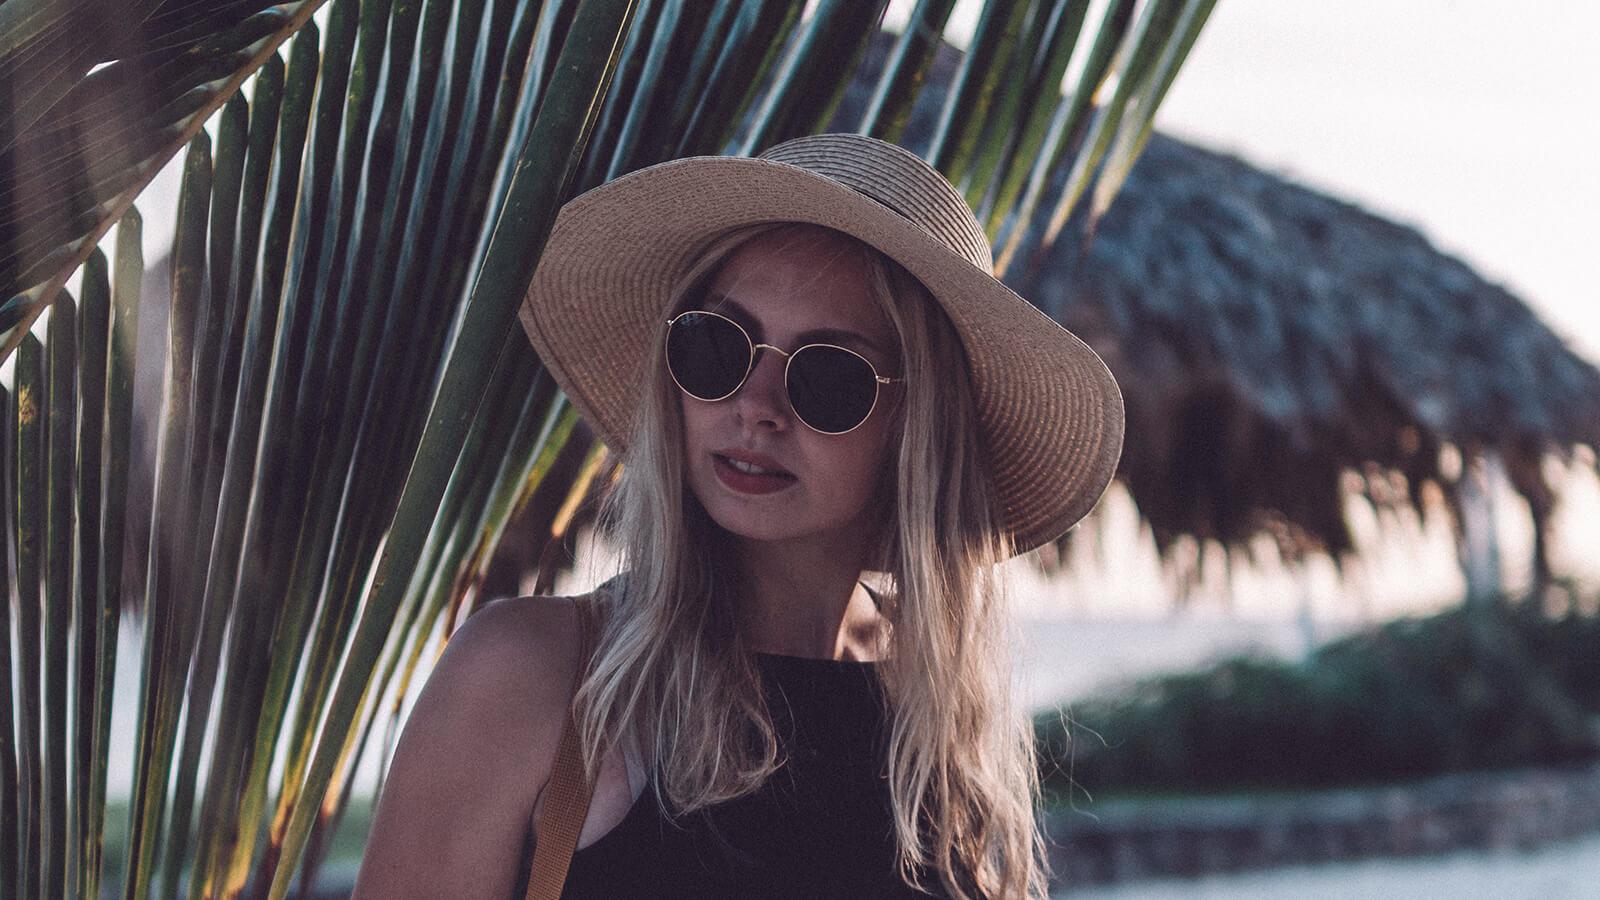 Dark sunglasses vs light tint UV 400 sunglasses.